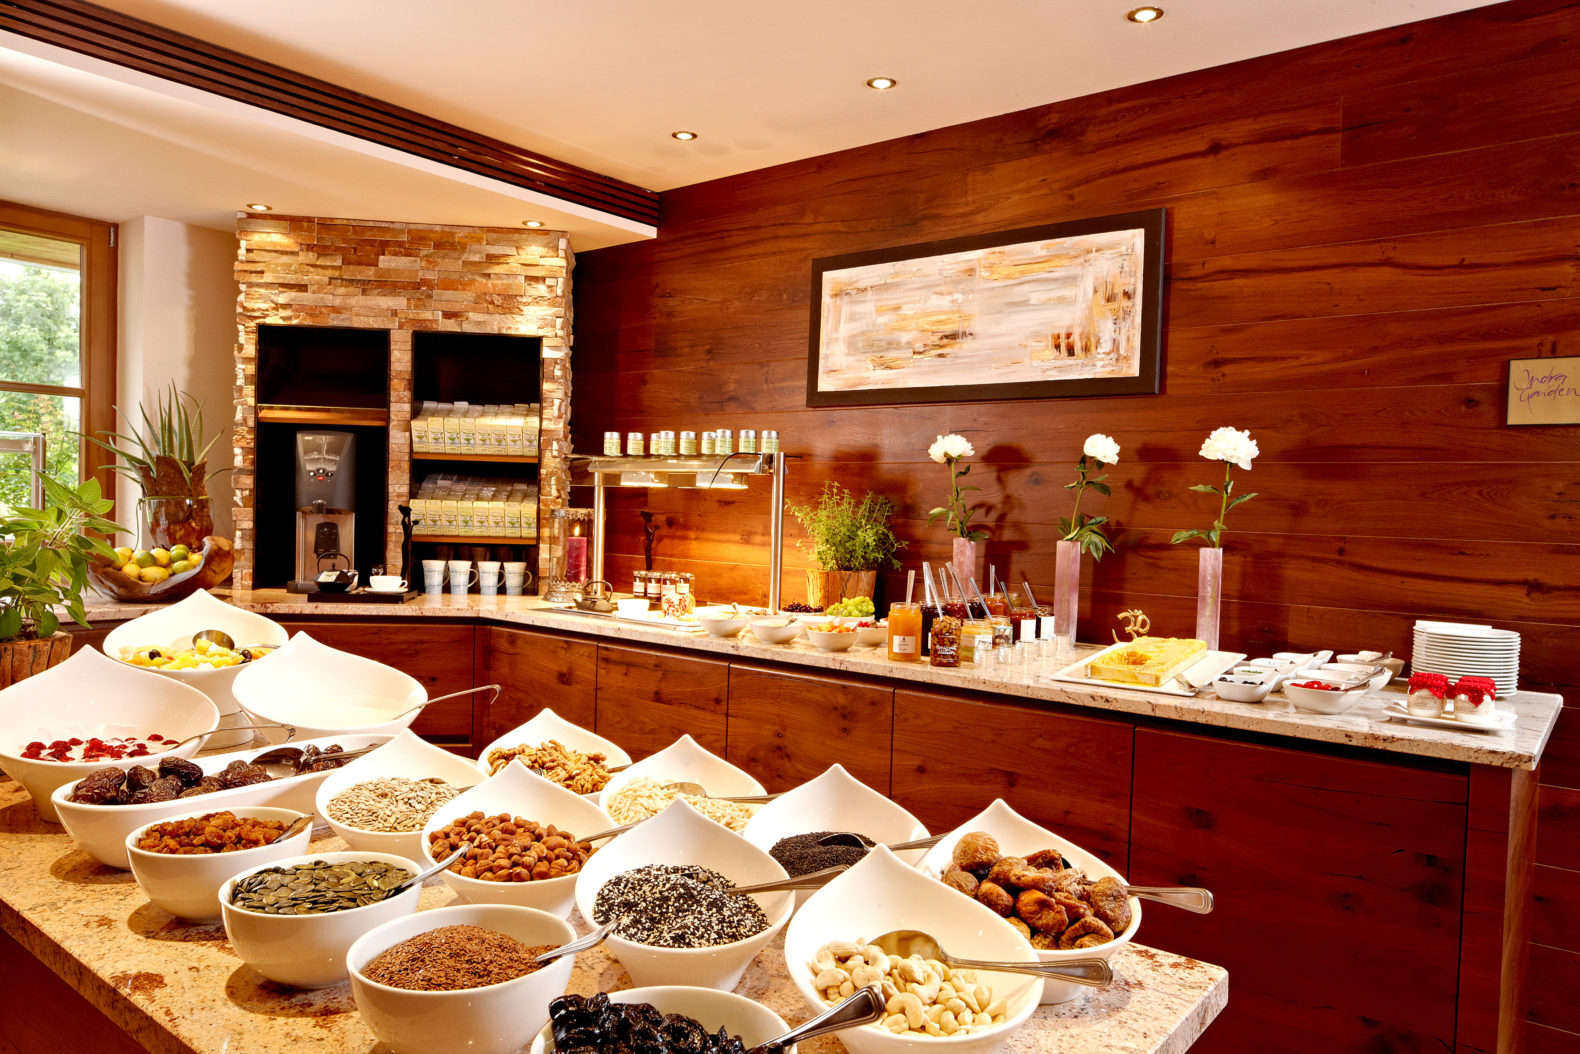 anapurna-buffet-healthy-cuisine-ayurveda-resort-sonnhof-austria